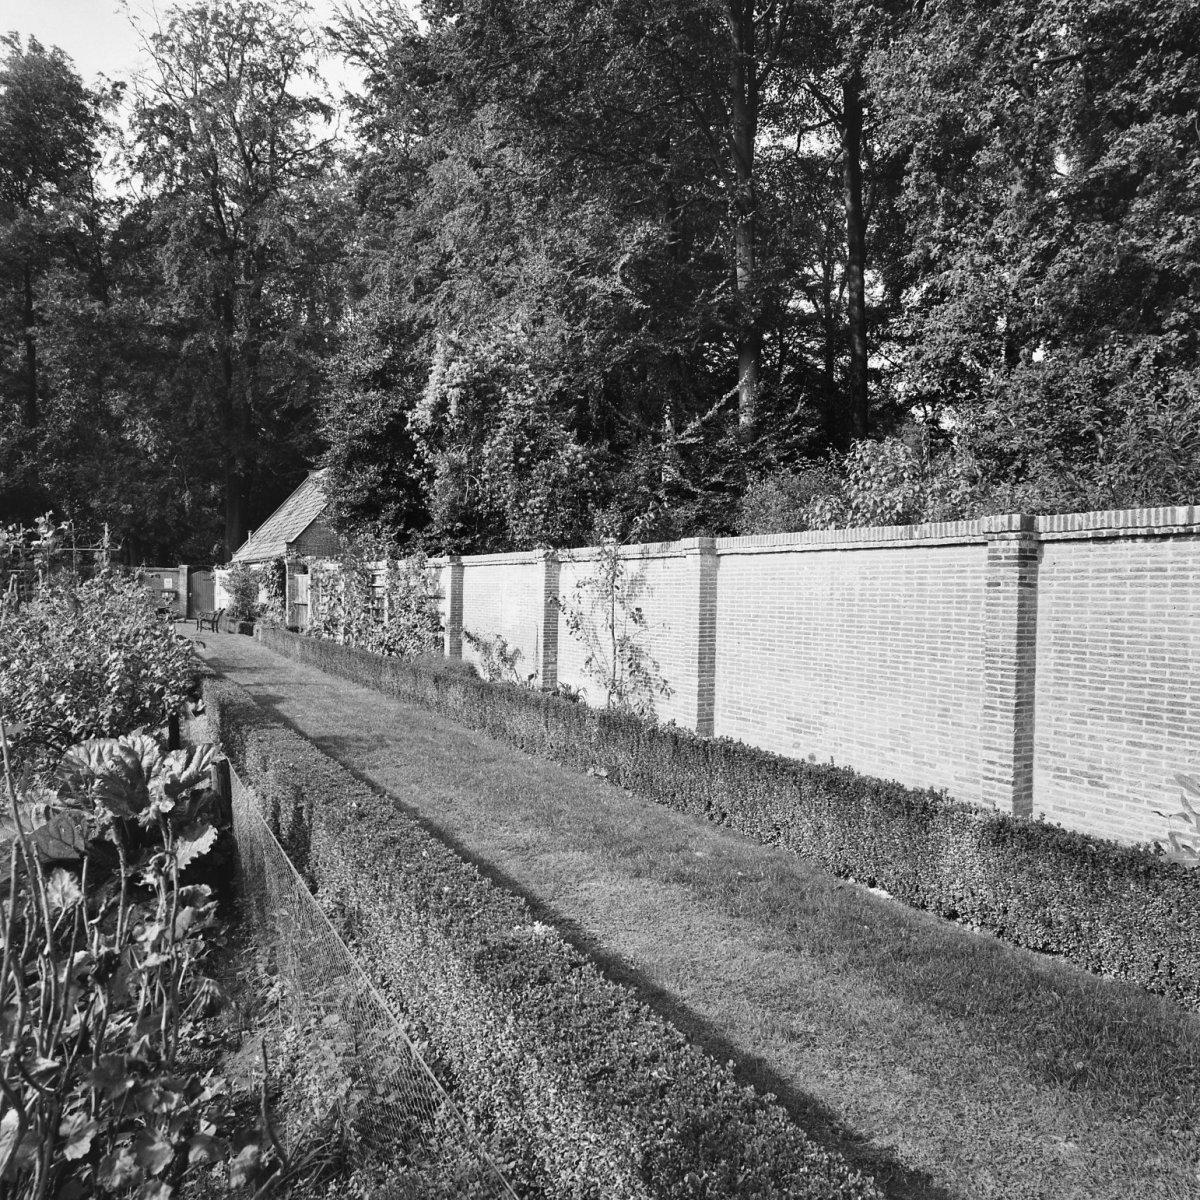 tuinmuur rechte fruitmuur Landhuis Gooilust in 's Graveland